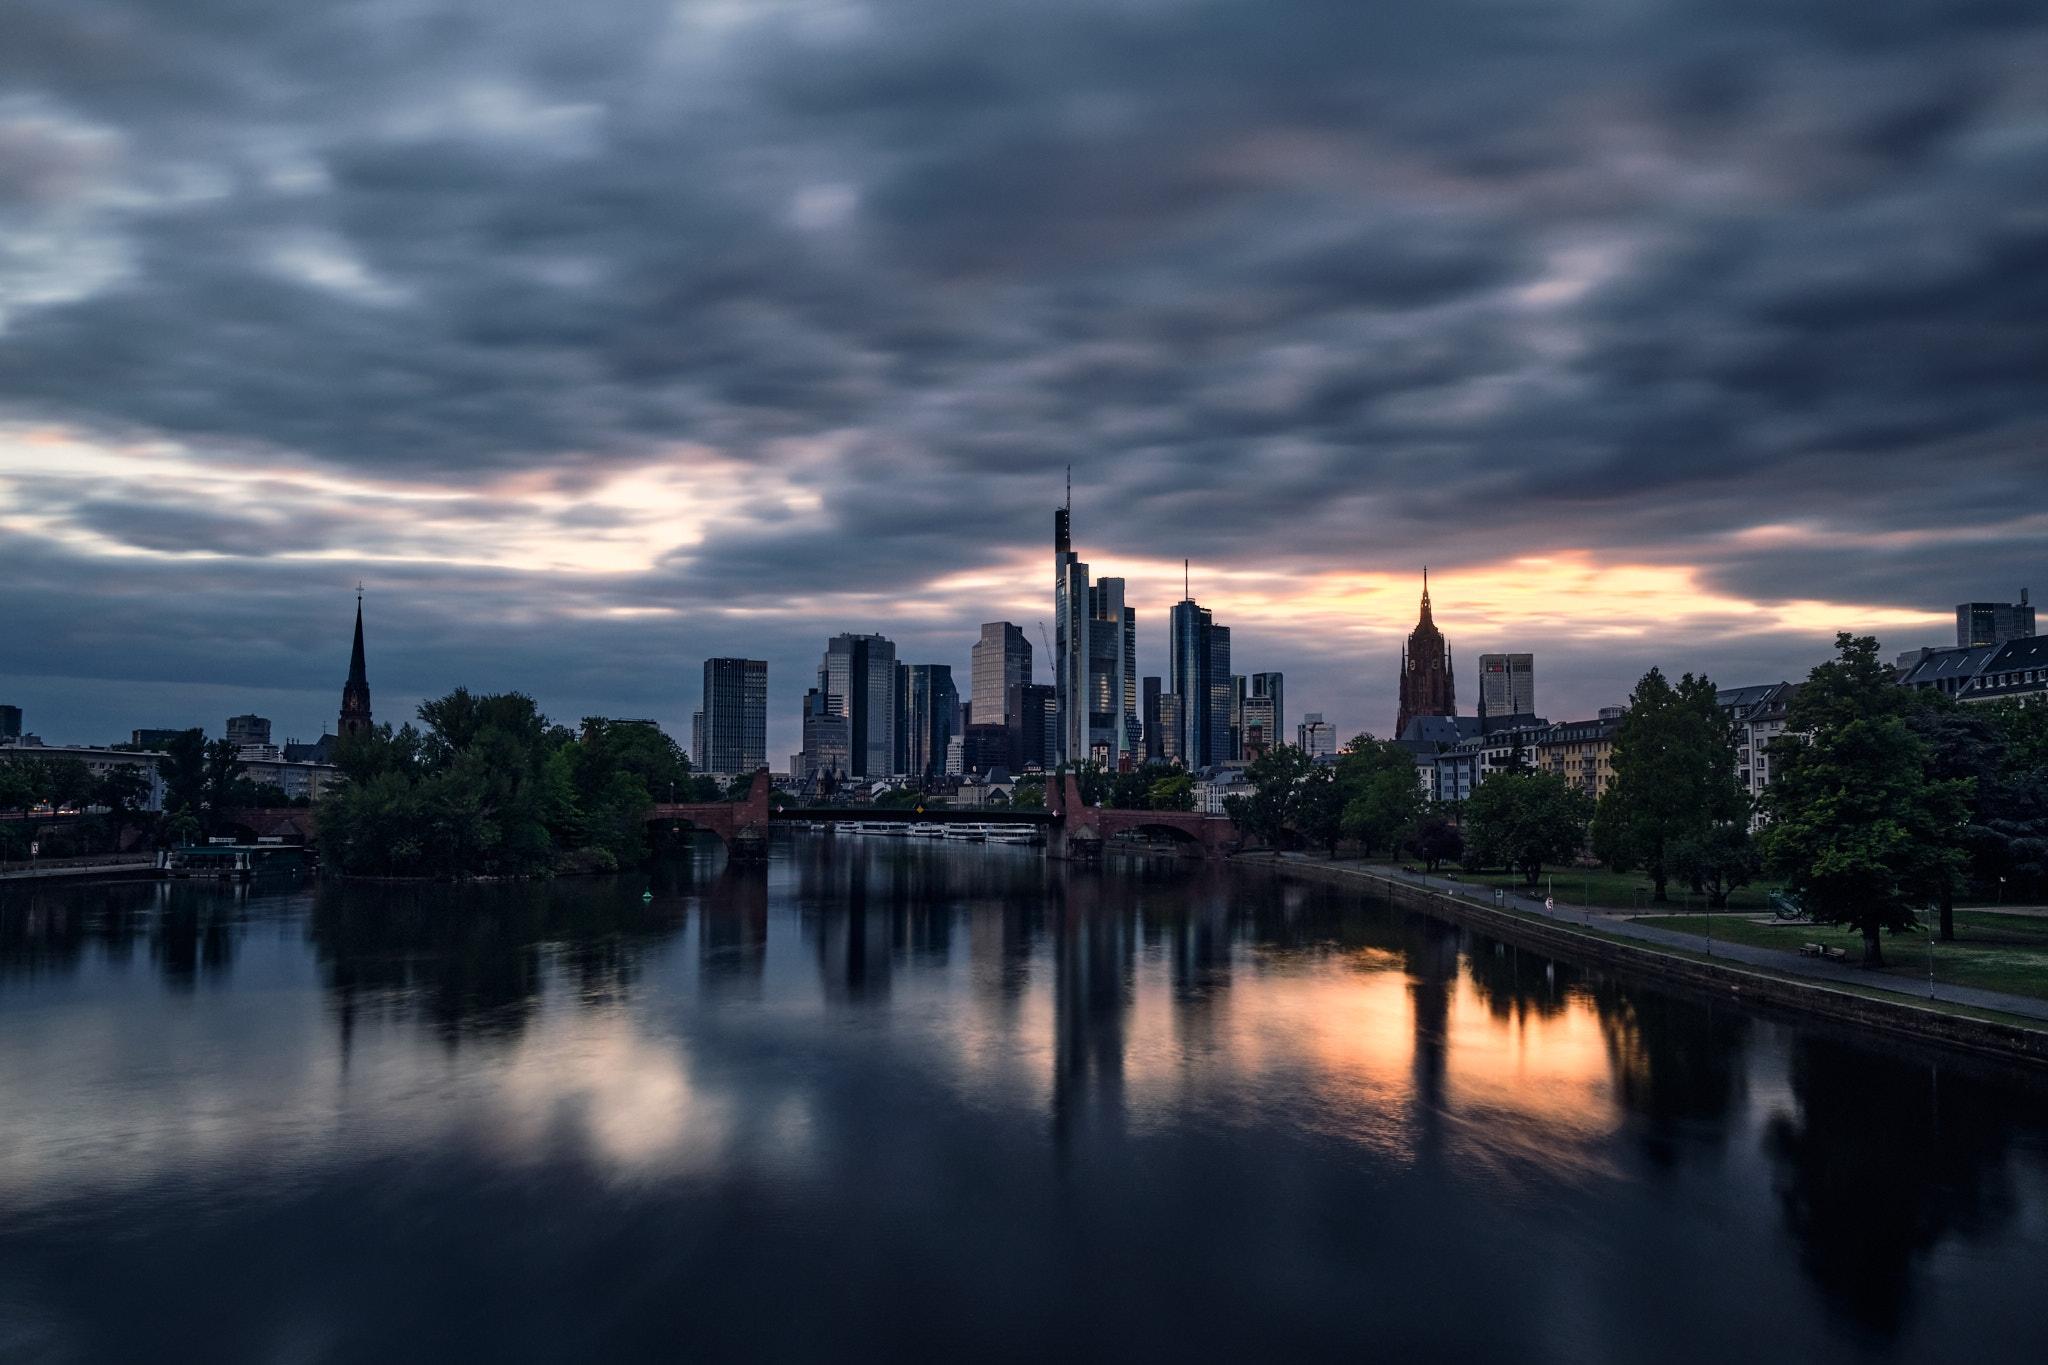 touching sky | frankfurt, germa - kleptography | ello